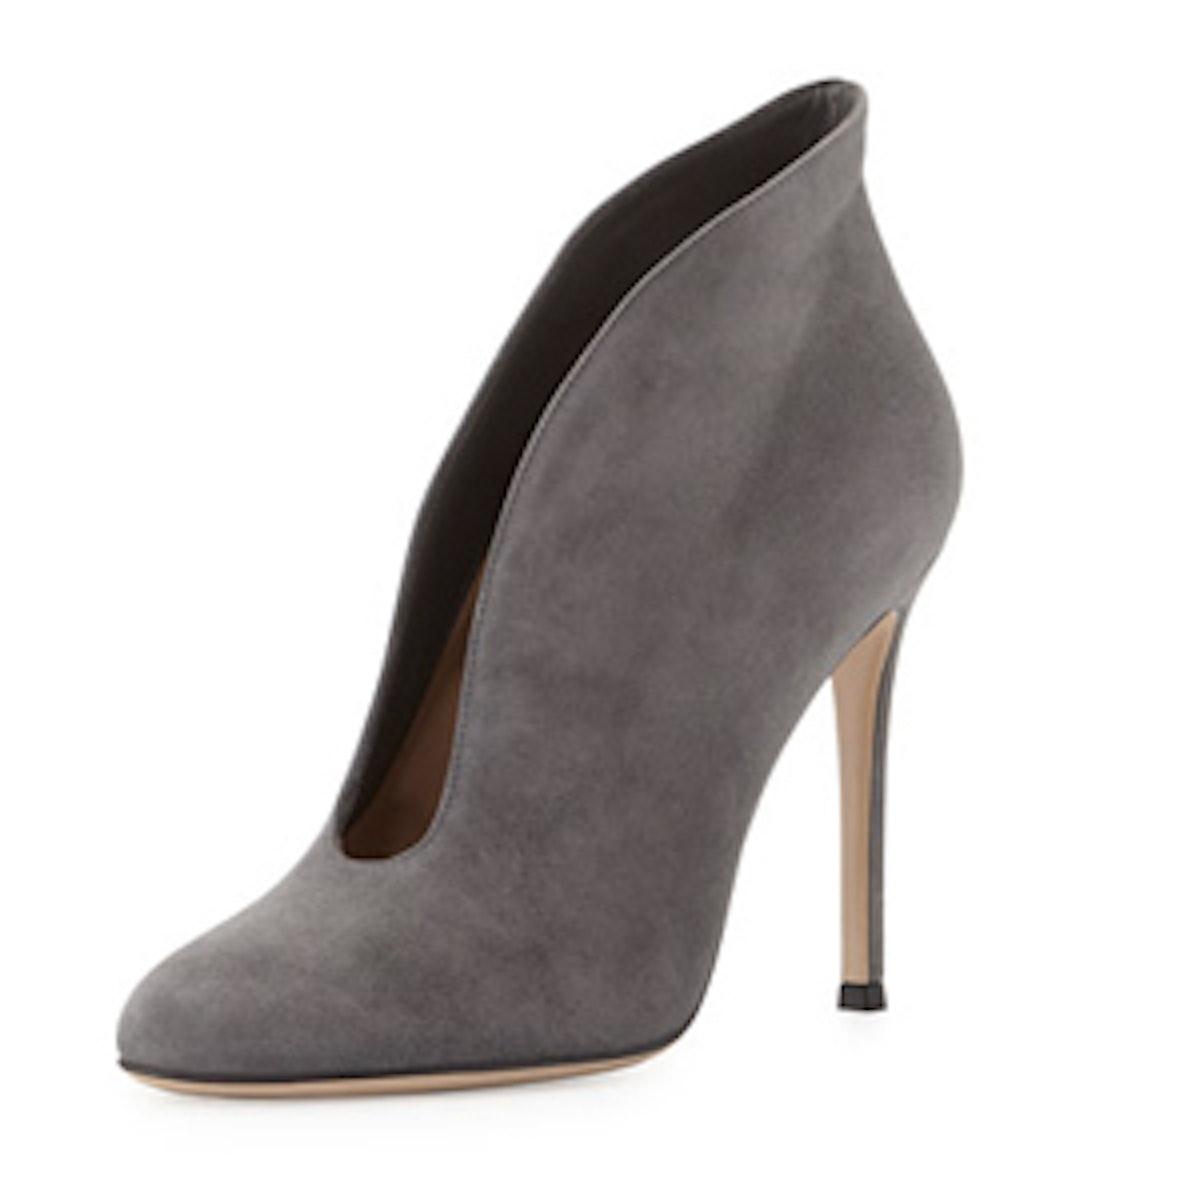 V-Neck Ankle Boot